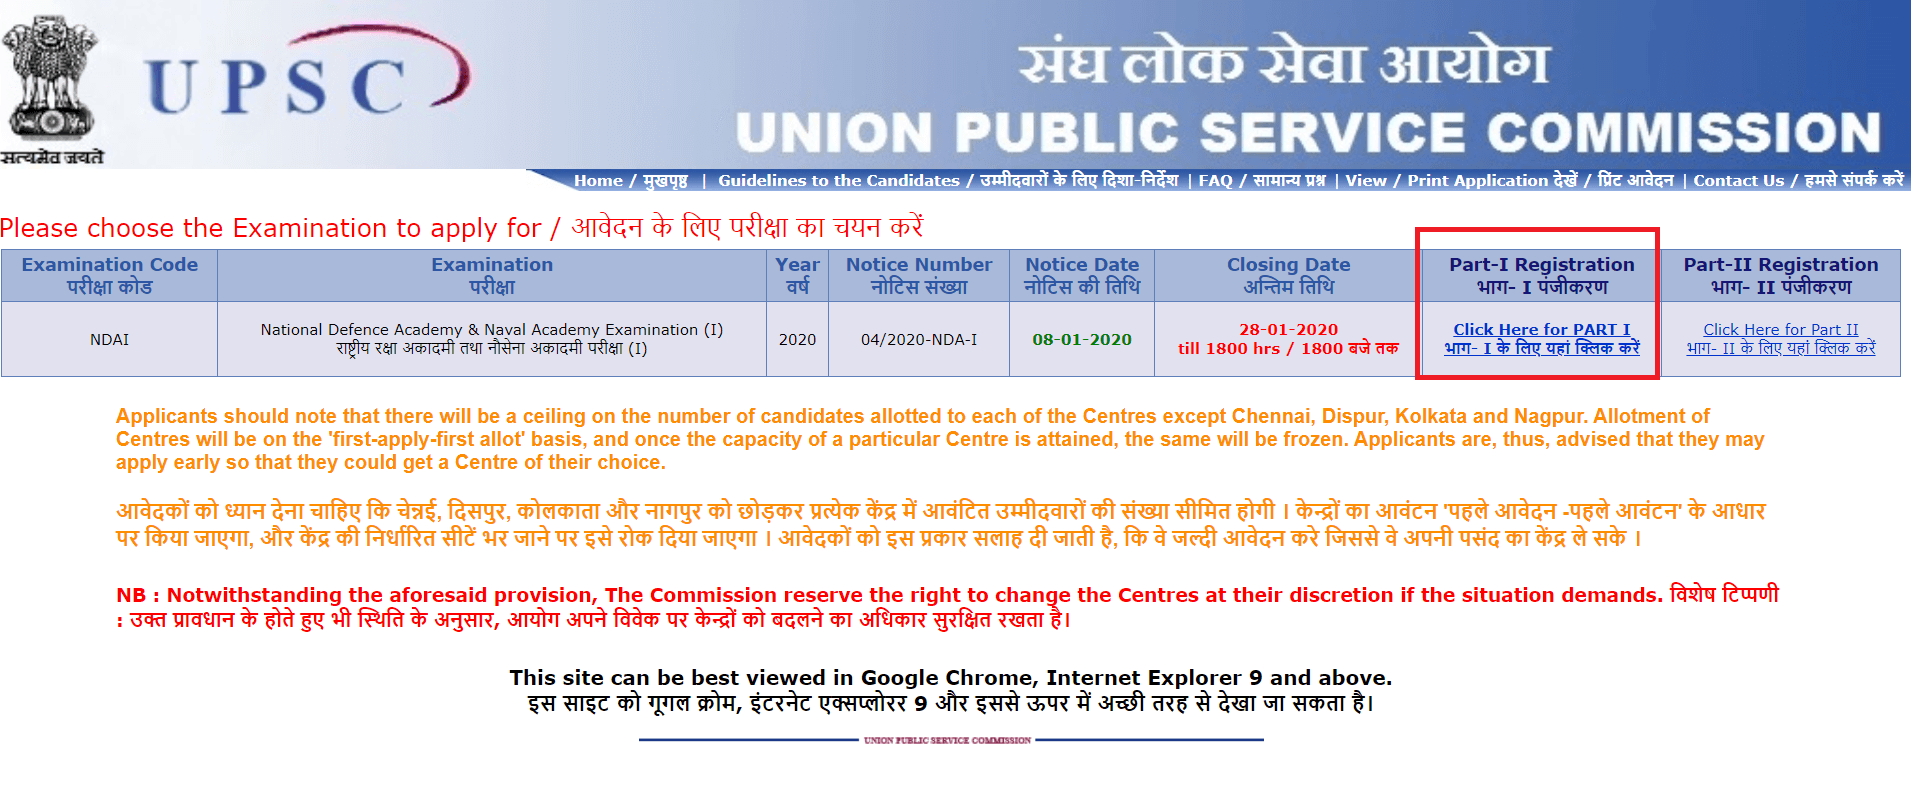 UPSC NDA NA Registration